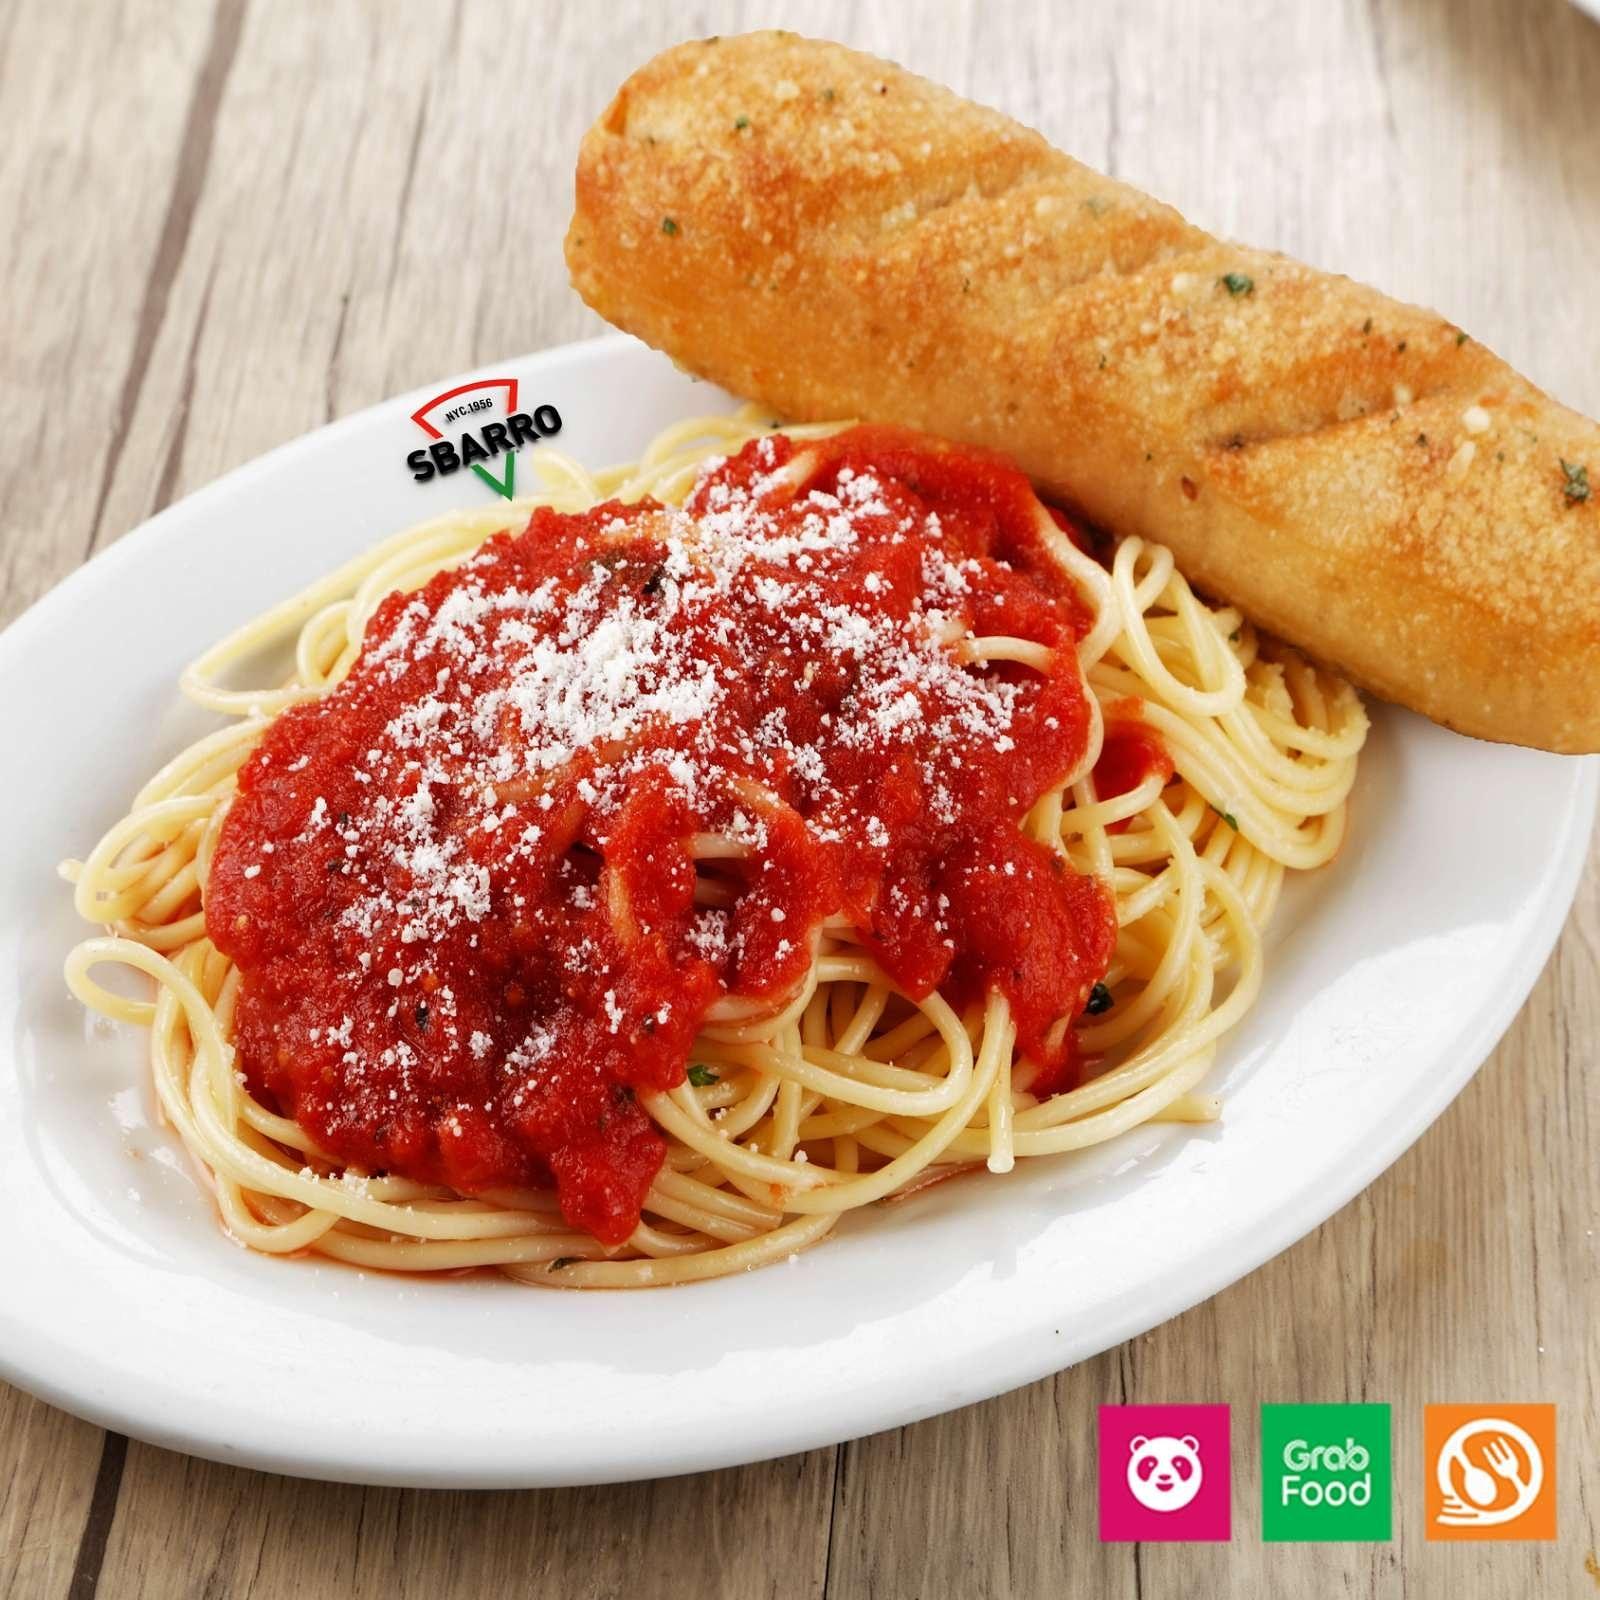 Sbarro's spaghetti with meat sauce